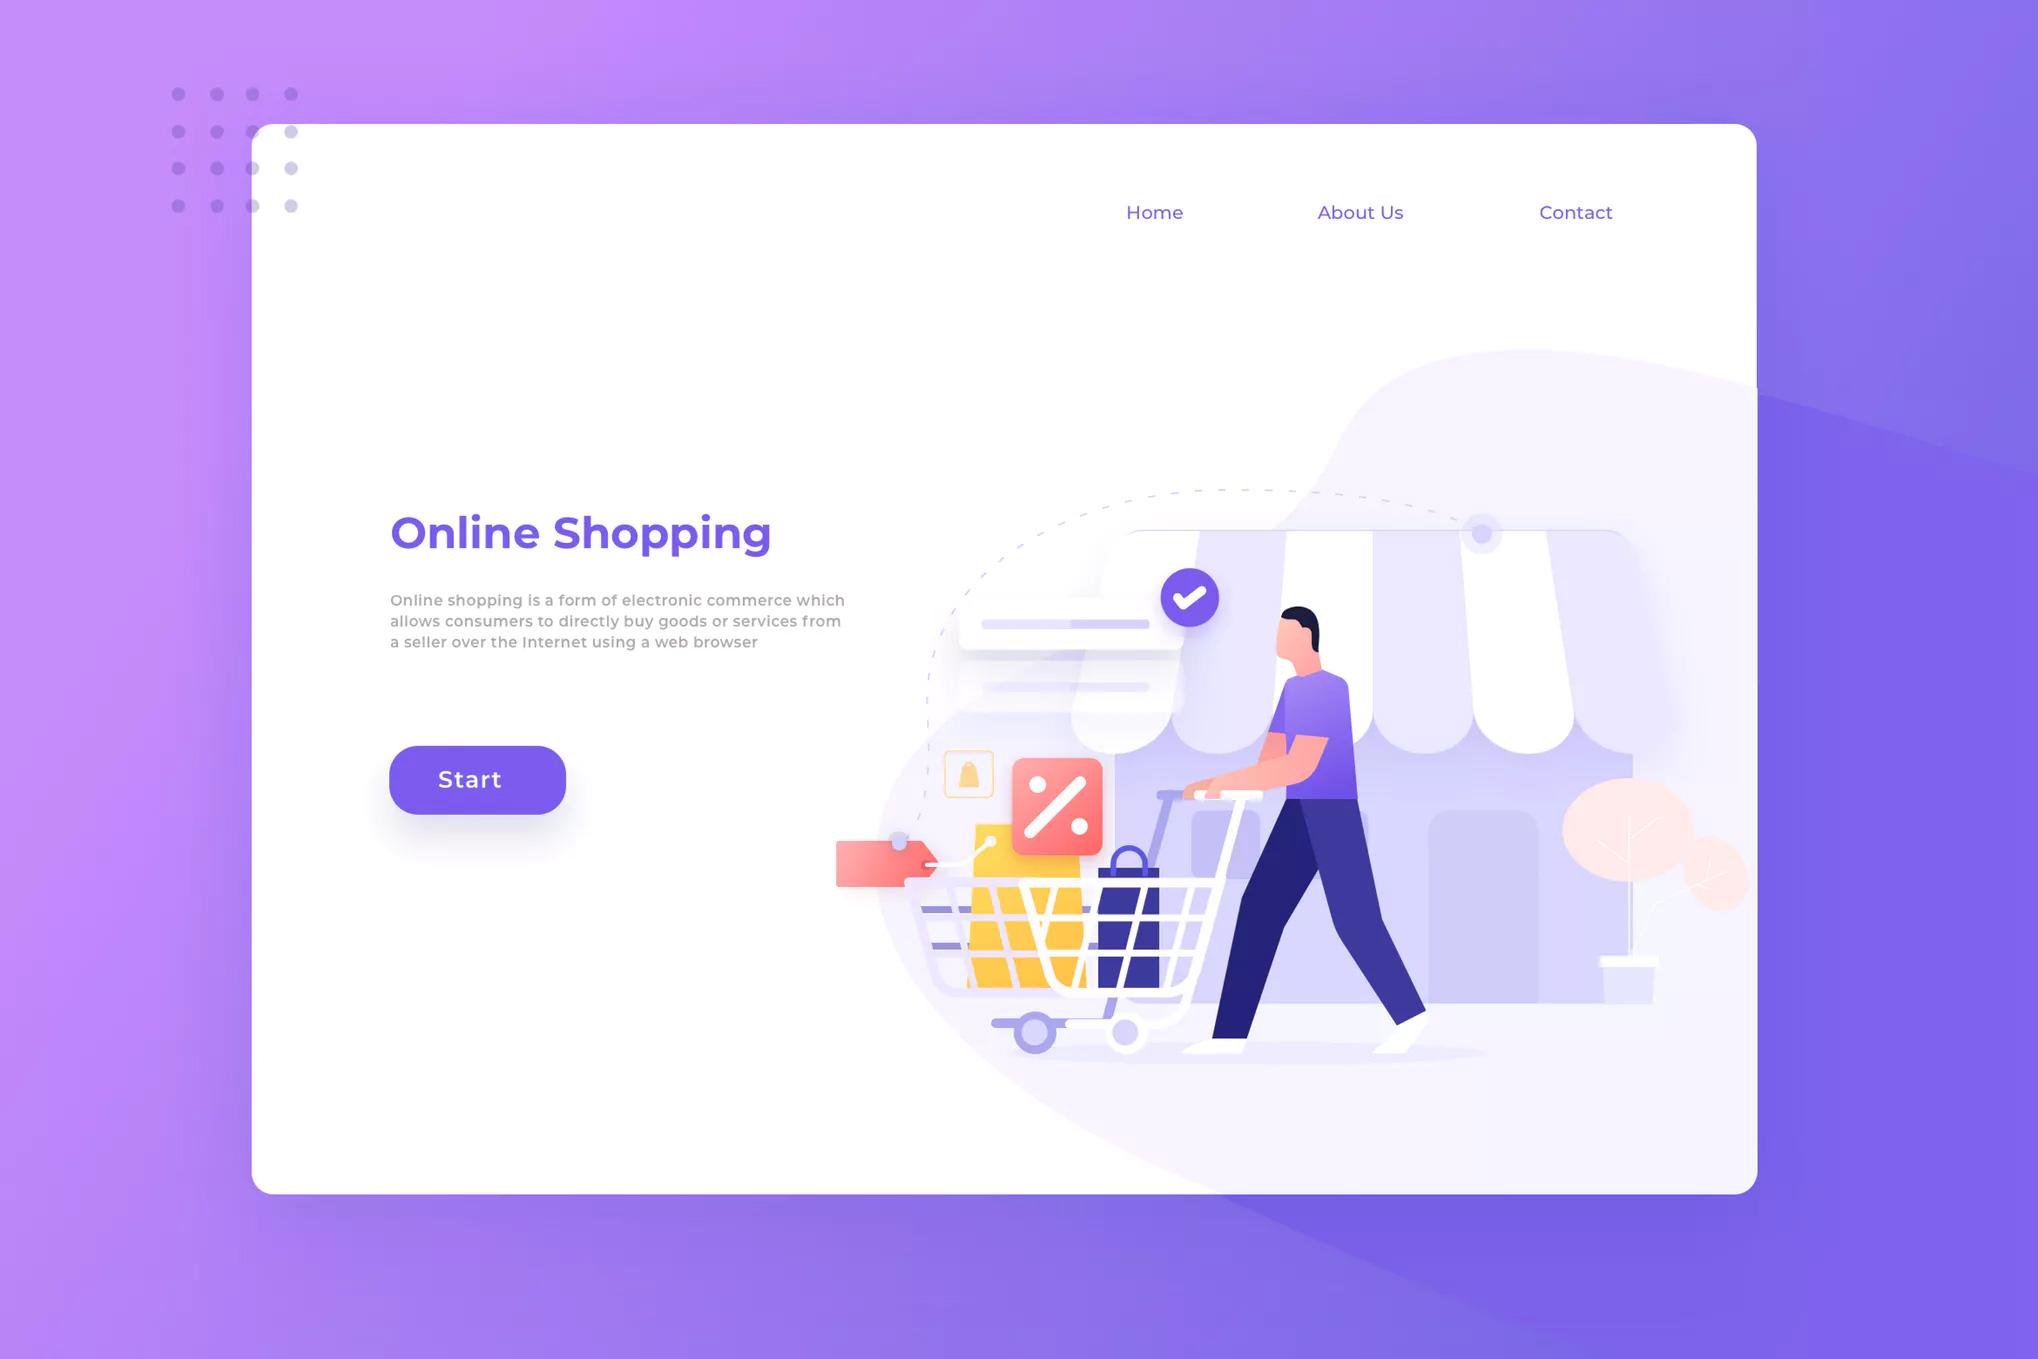 WEB端在线购物登陆页面插画风格模版 Online Shopping Landing Page Illustration